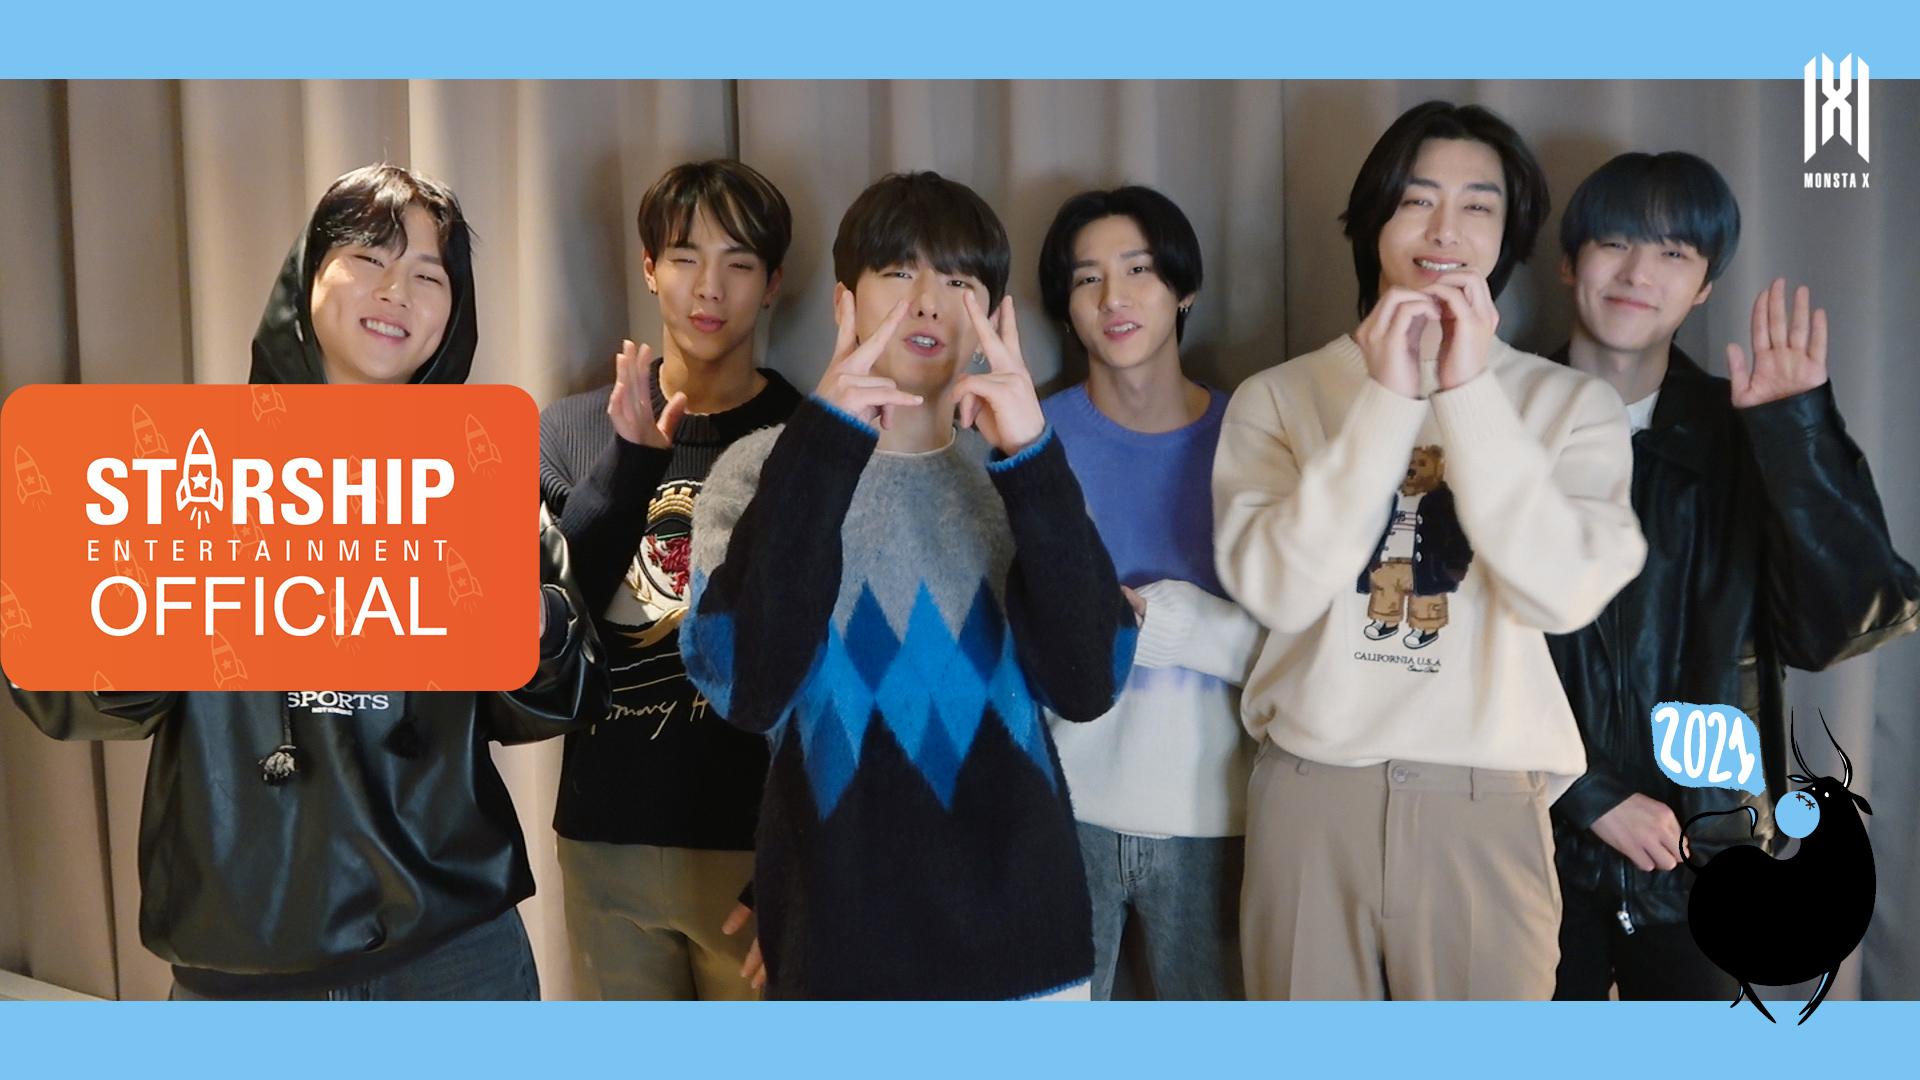 [Special Clip] MONSTA X (몬스타엑스) - 2021 새해 인사 (2021 New Years Greetings)